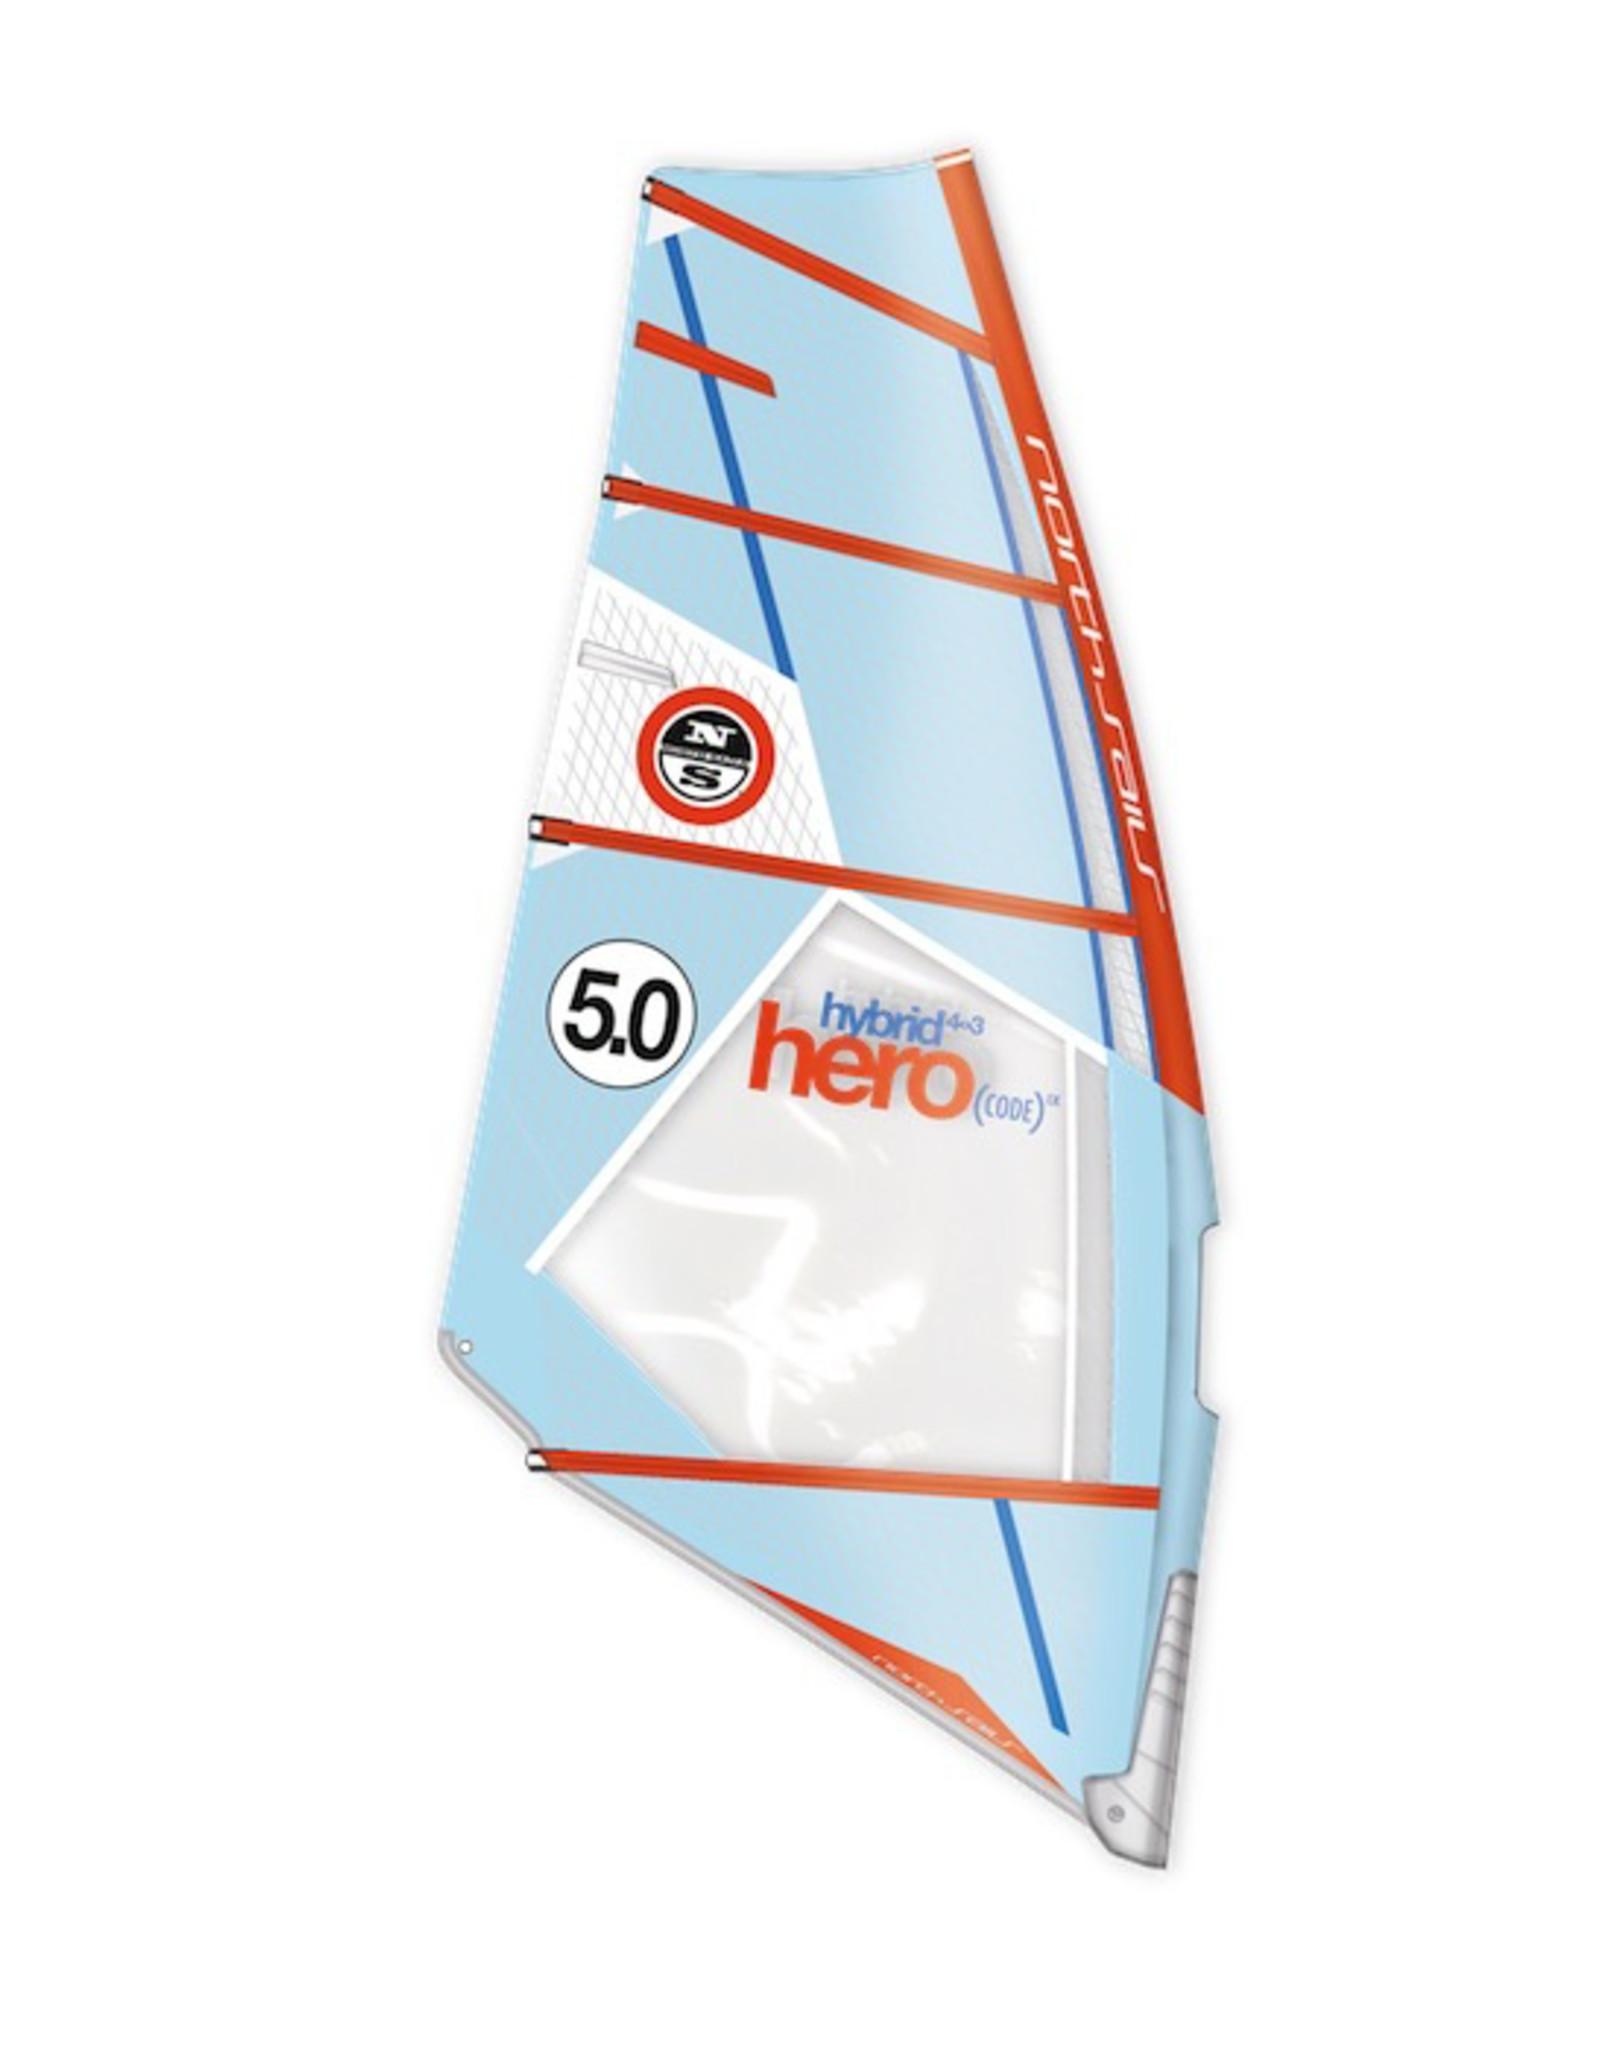 NSW - 4,2m2 Hero Hybrid (CODE) IX C90-light blue-orange